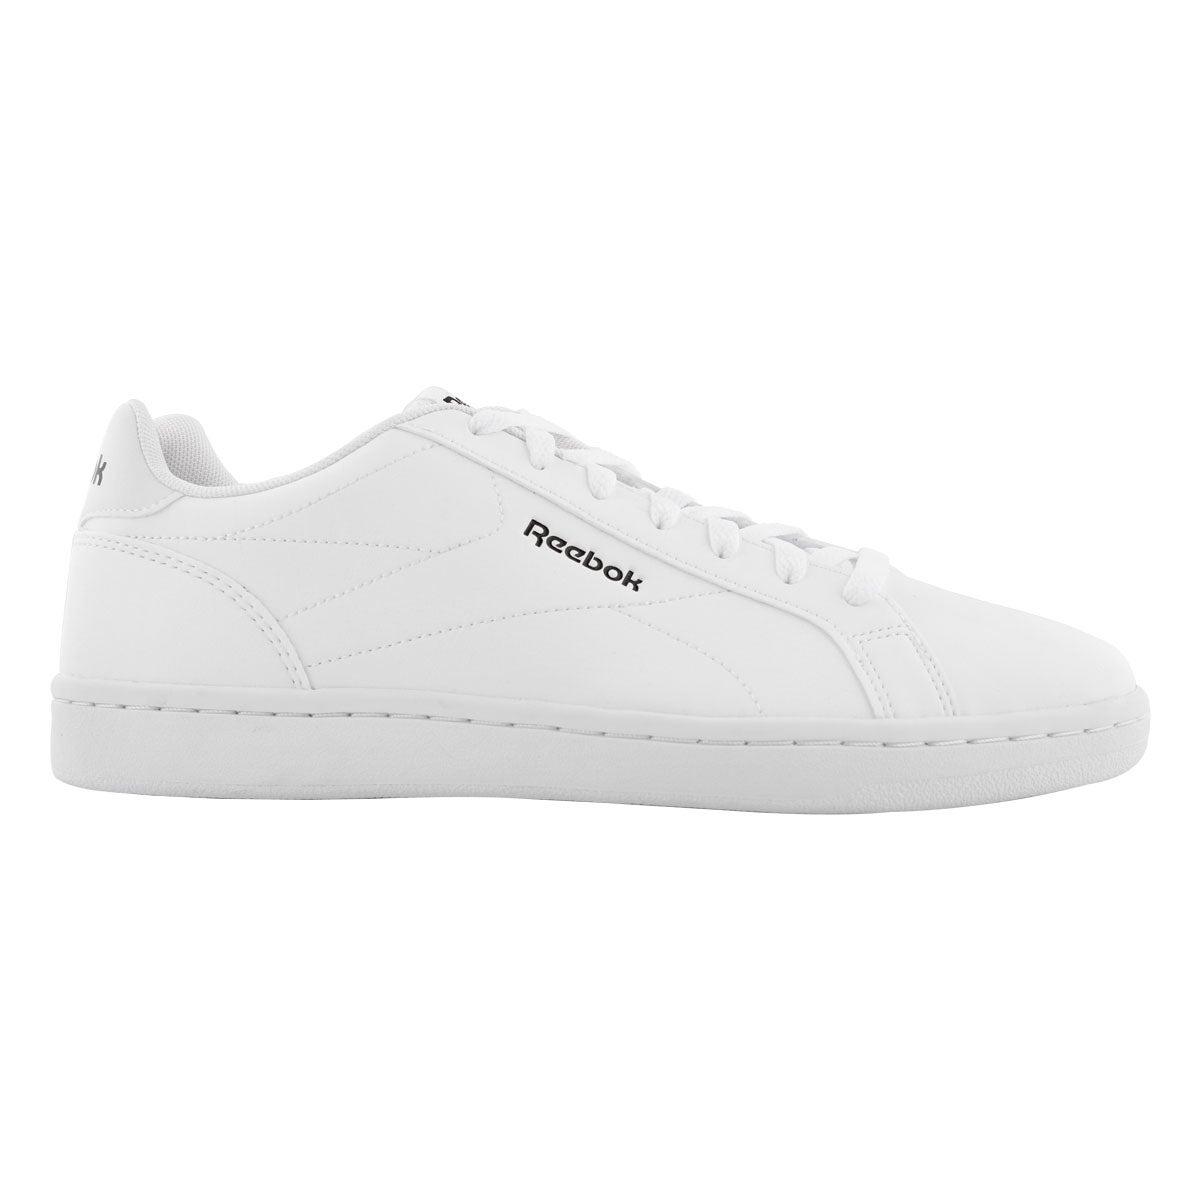 Mns Complete Clean wt/bk fashion sneaker